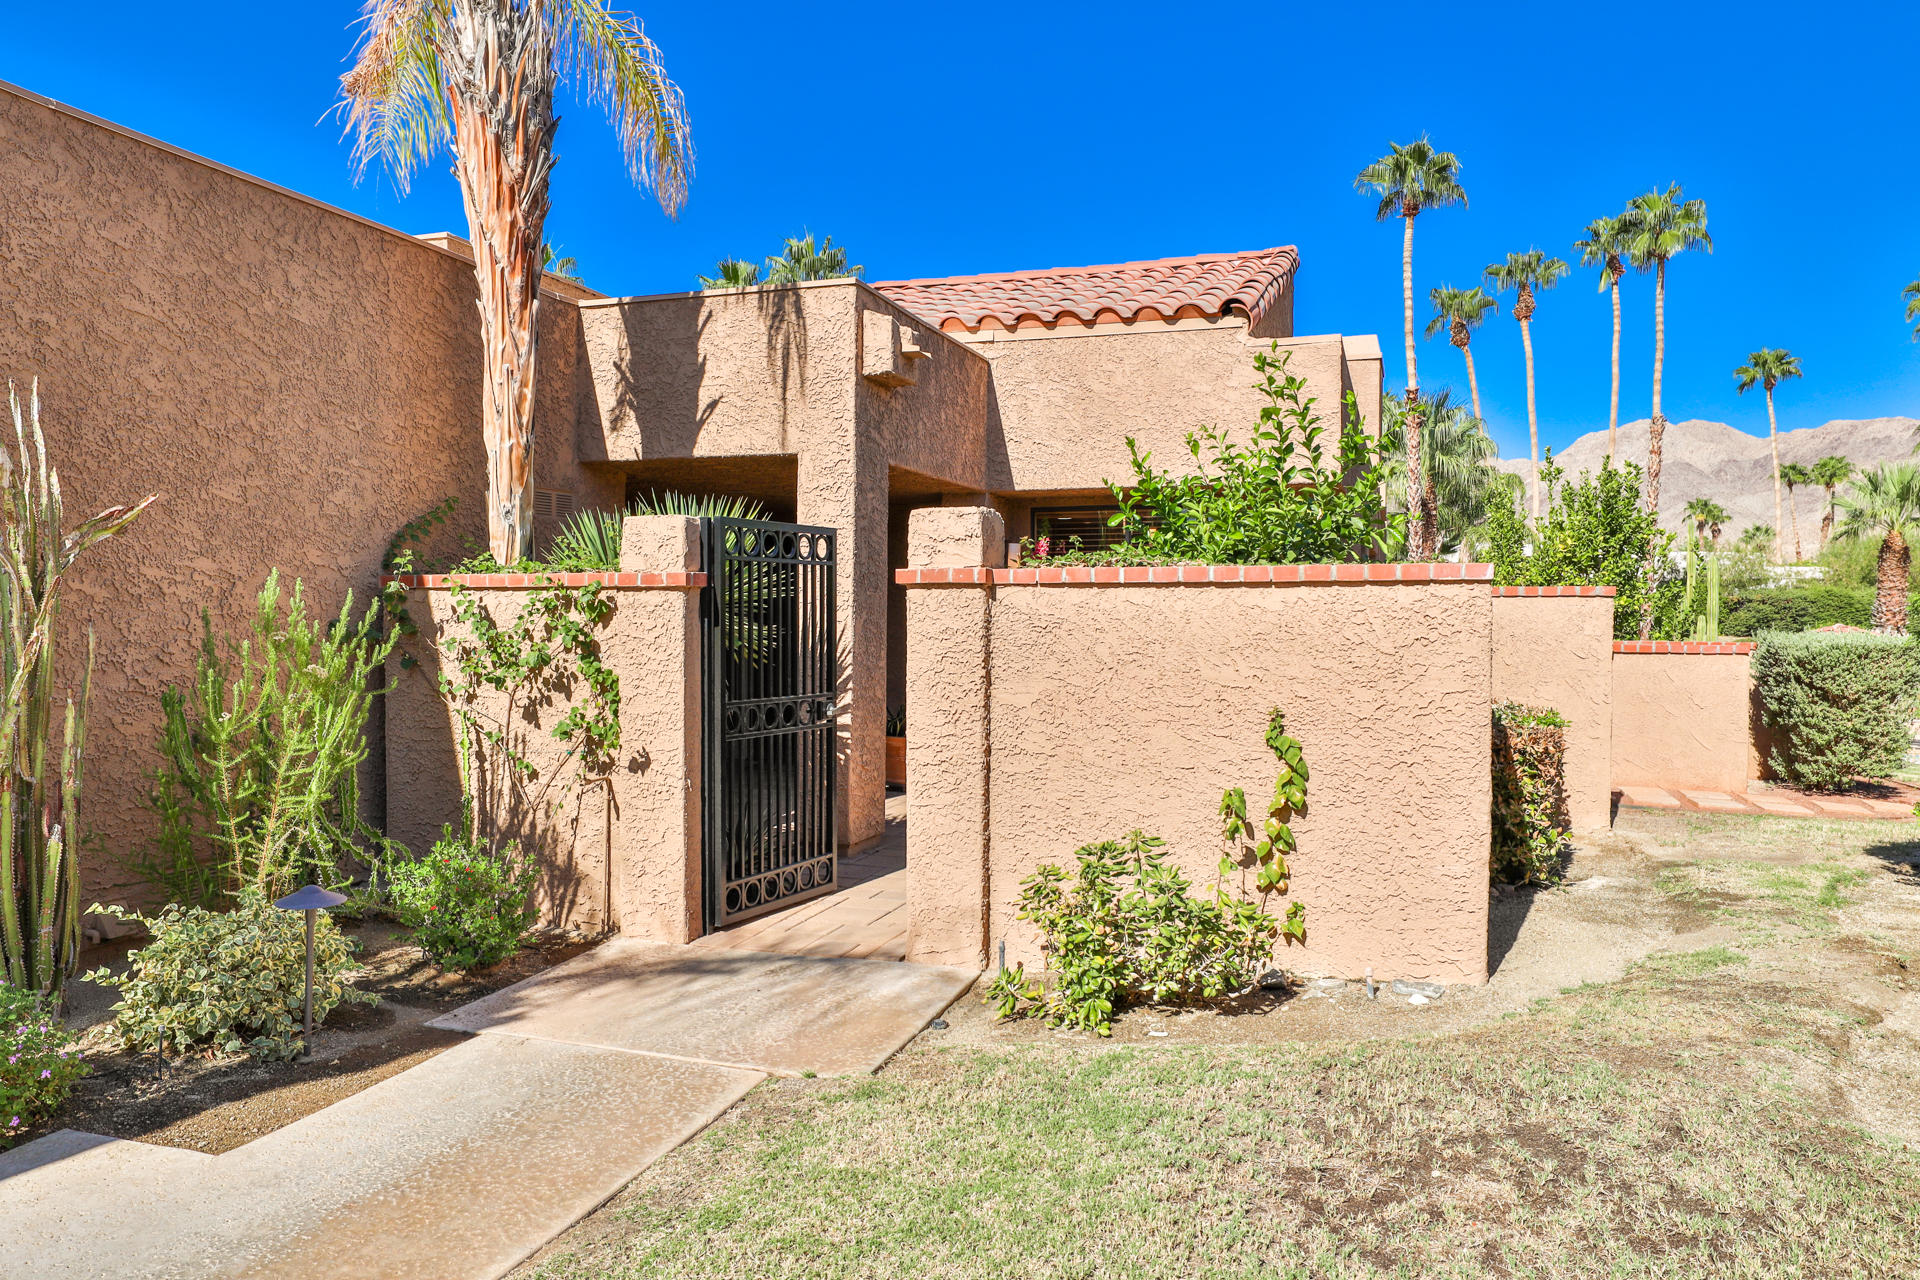 Photo of 73100 Ajo Lane, Palm Desert, CA 92260